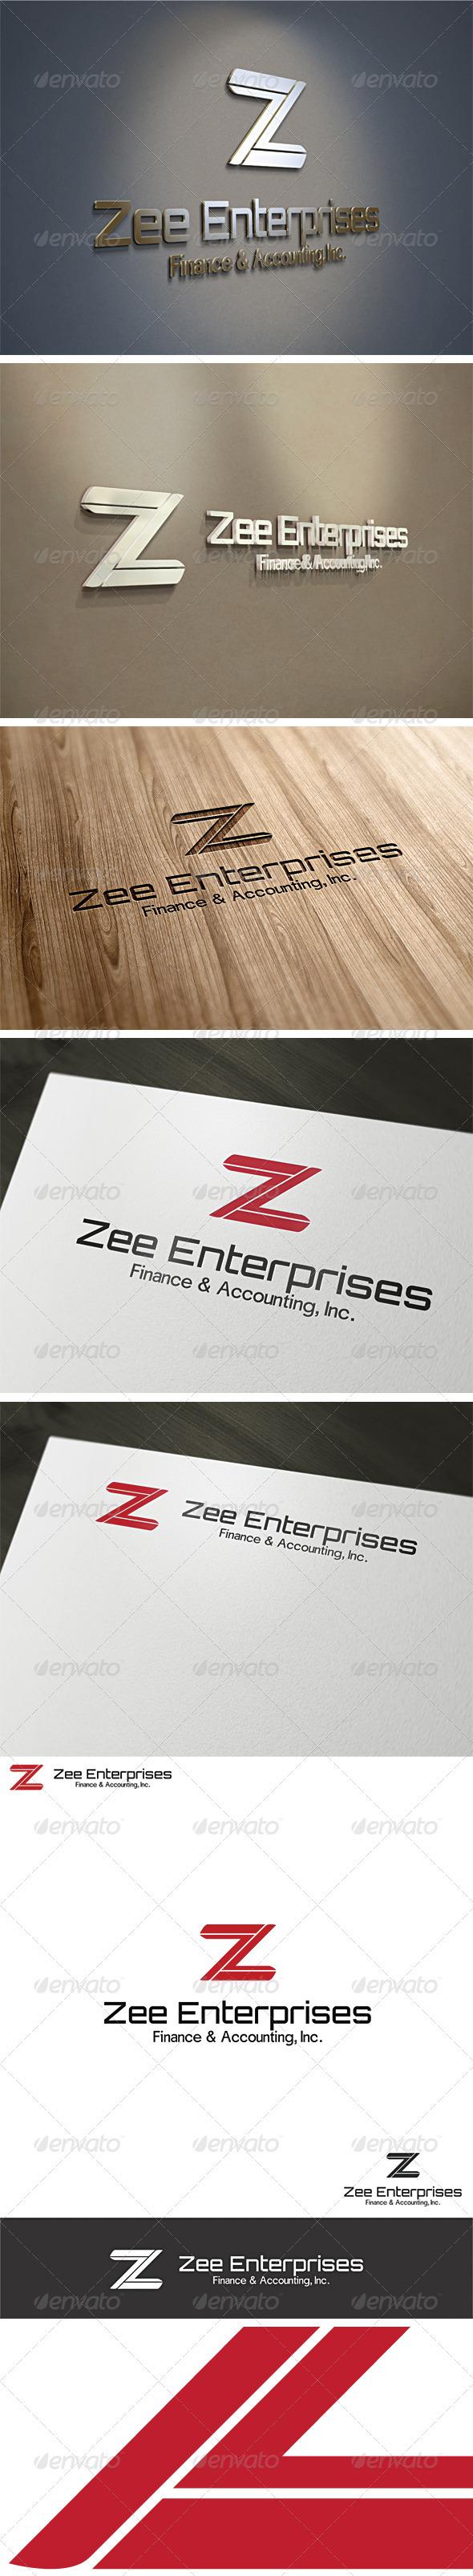 Letter Z - Zee Enterprises Logo Template - Letters Logo Templates